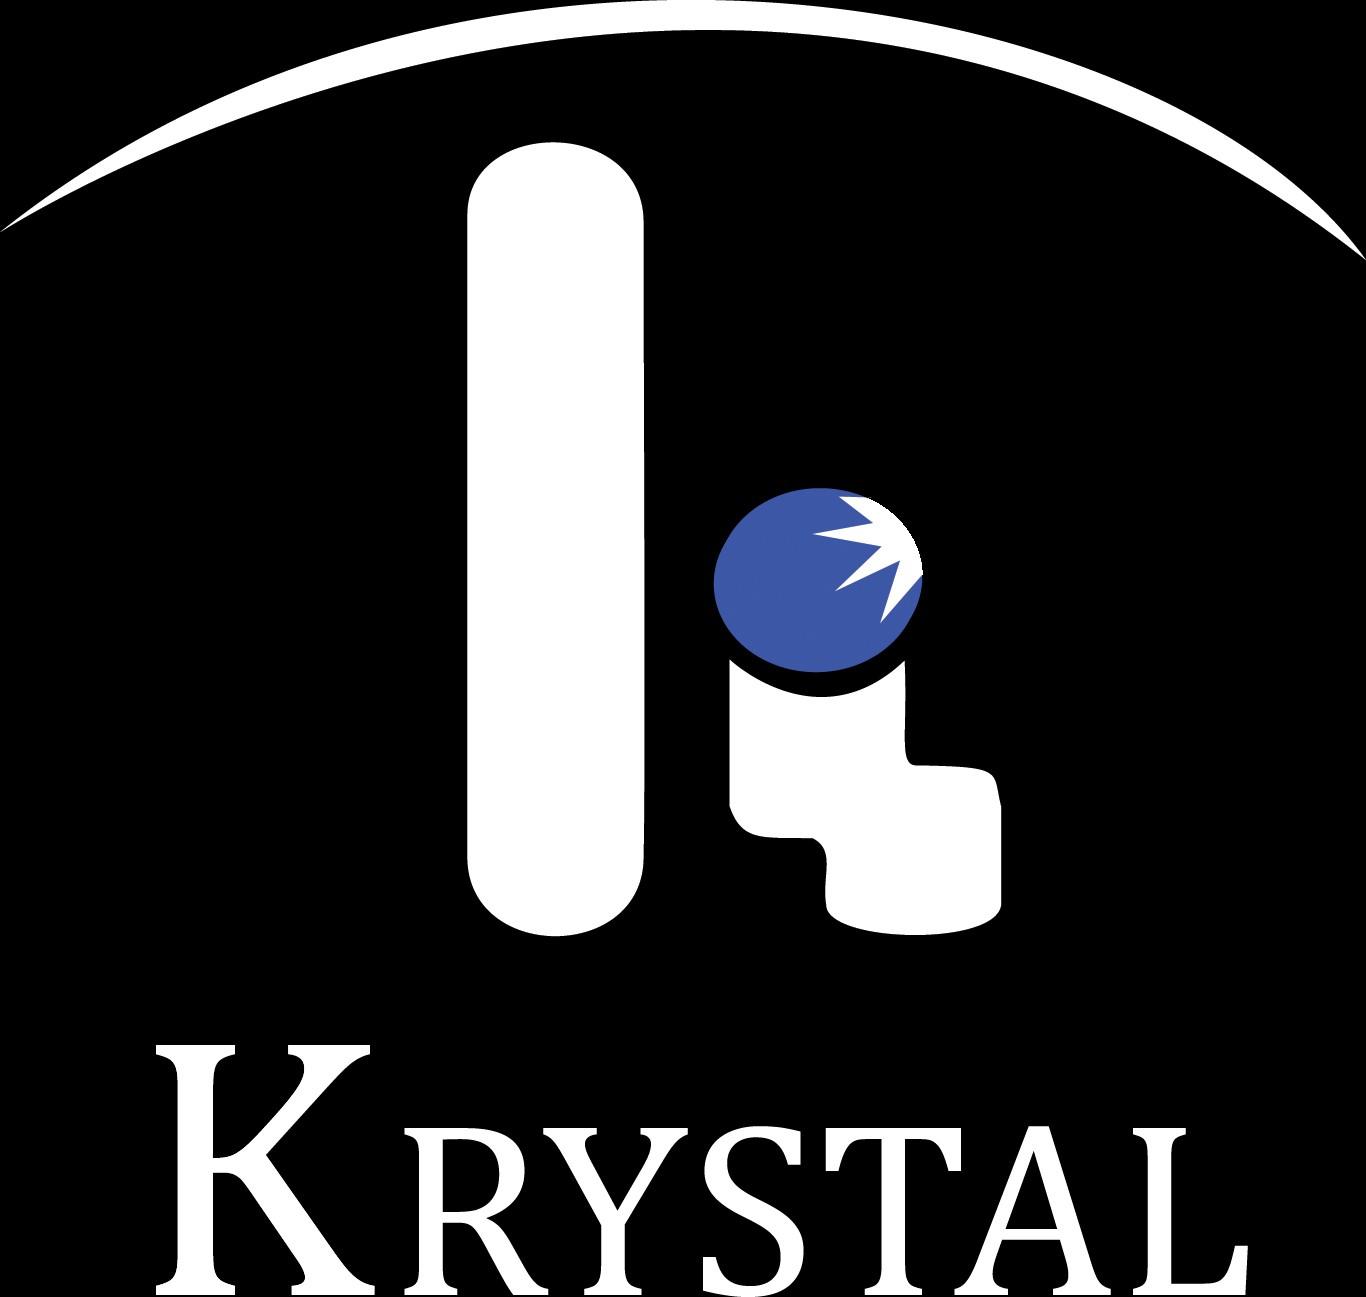 krystal black logo.jpg